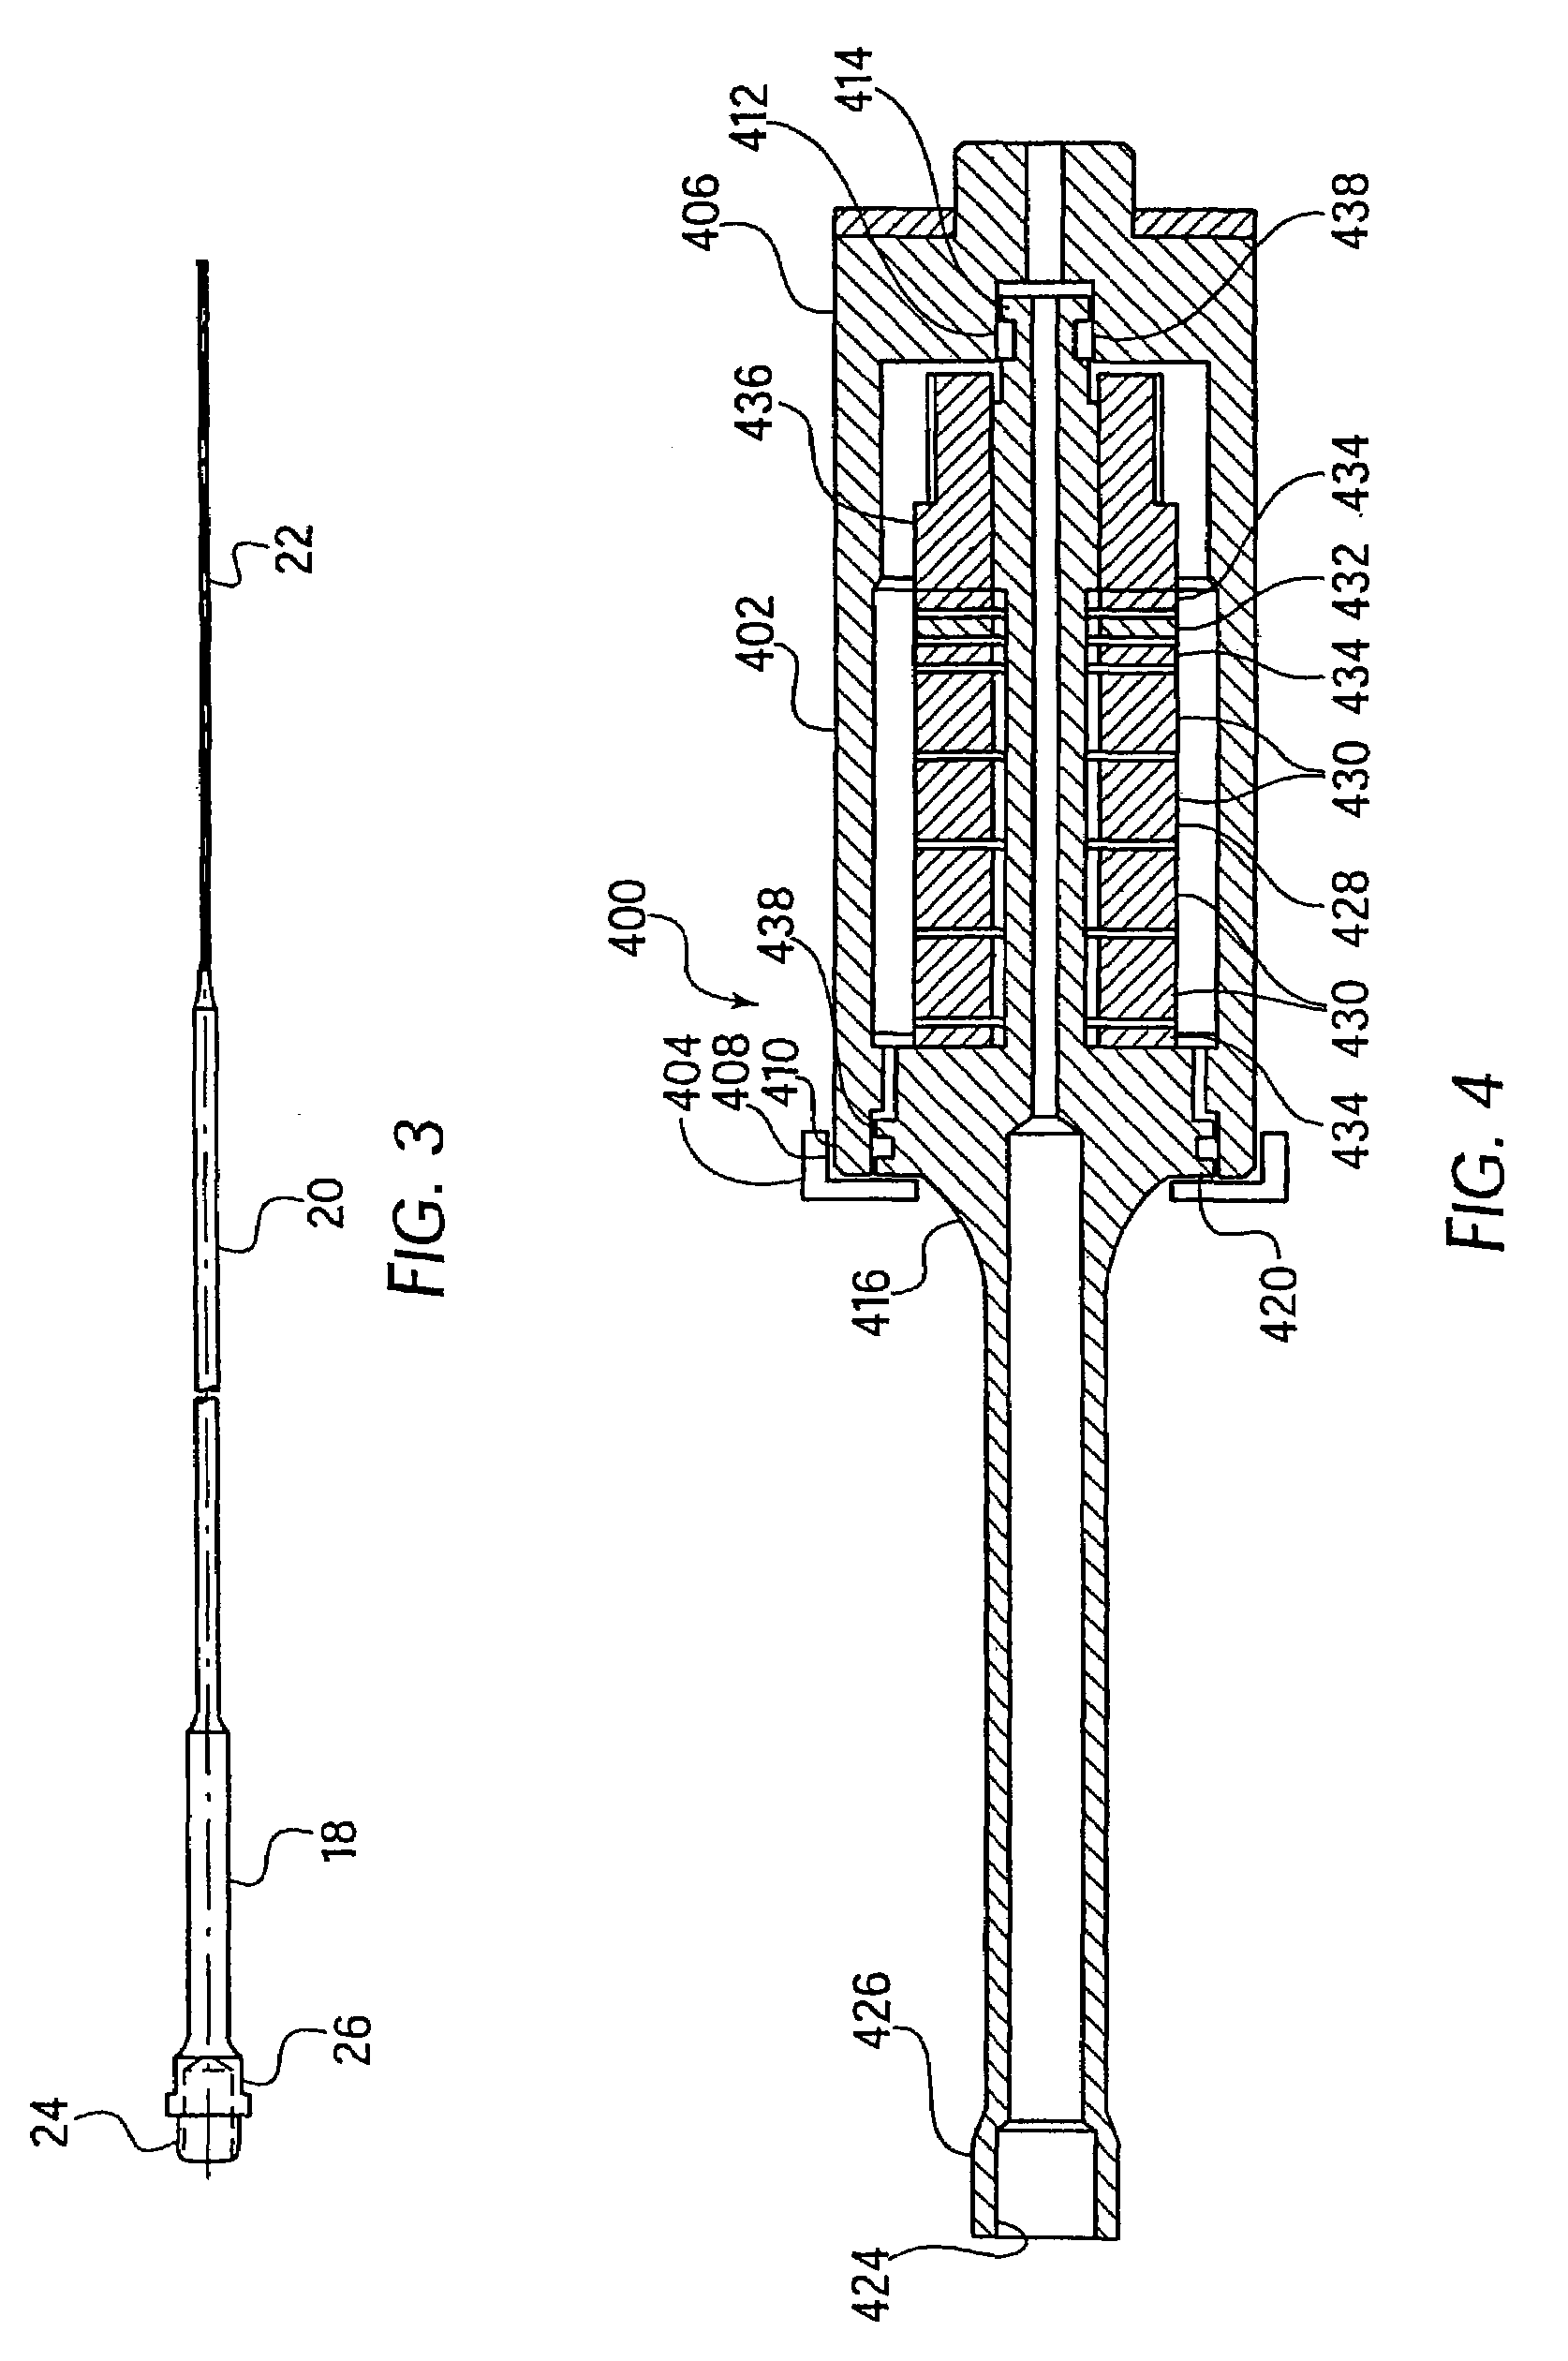 Patent Us 7494468 B2 Hydraulic Floor Jack Parts Diagram